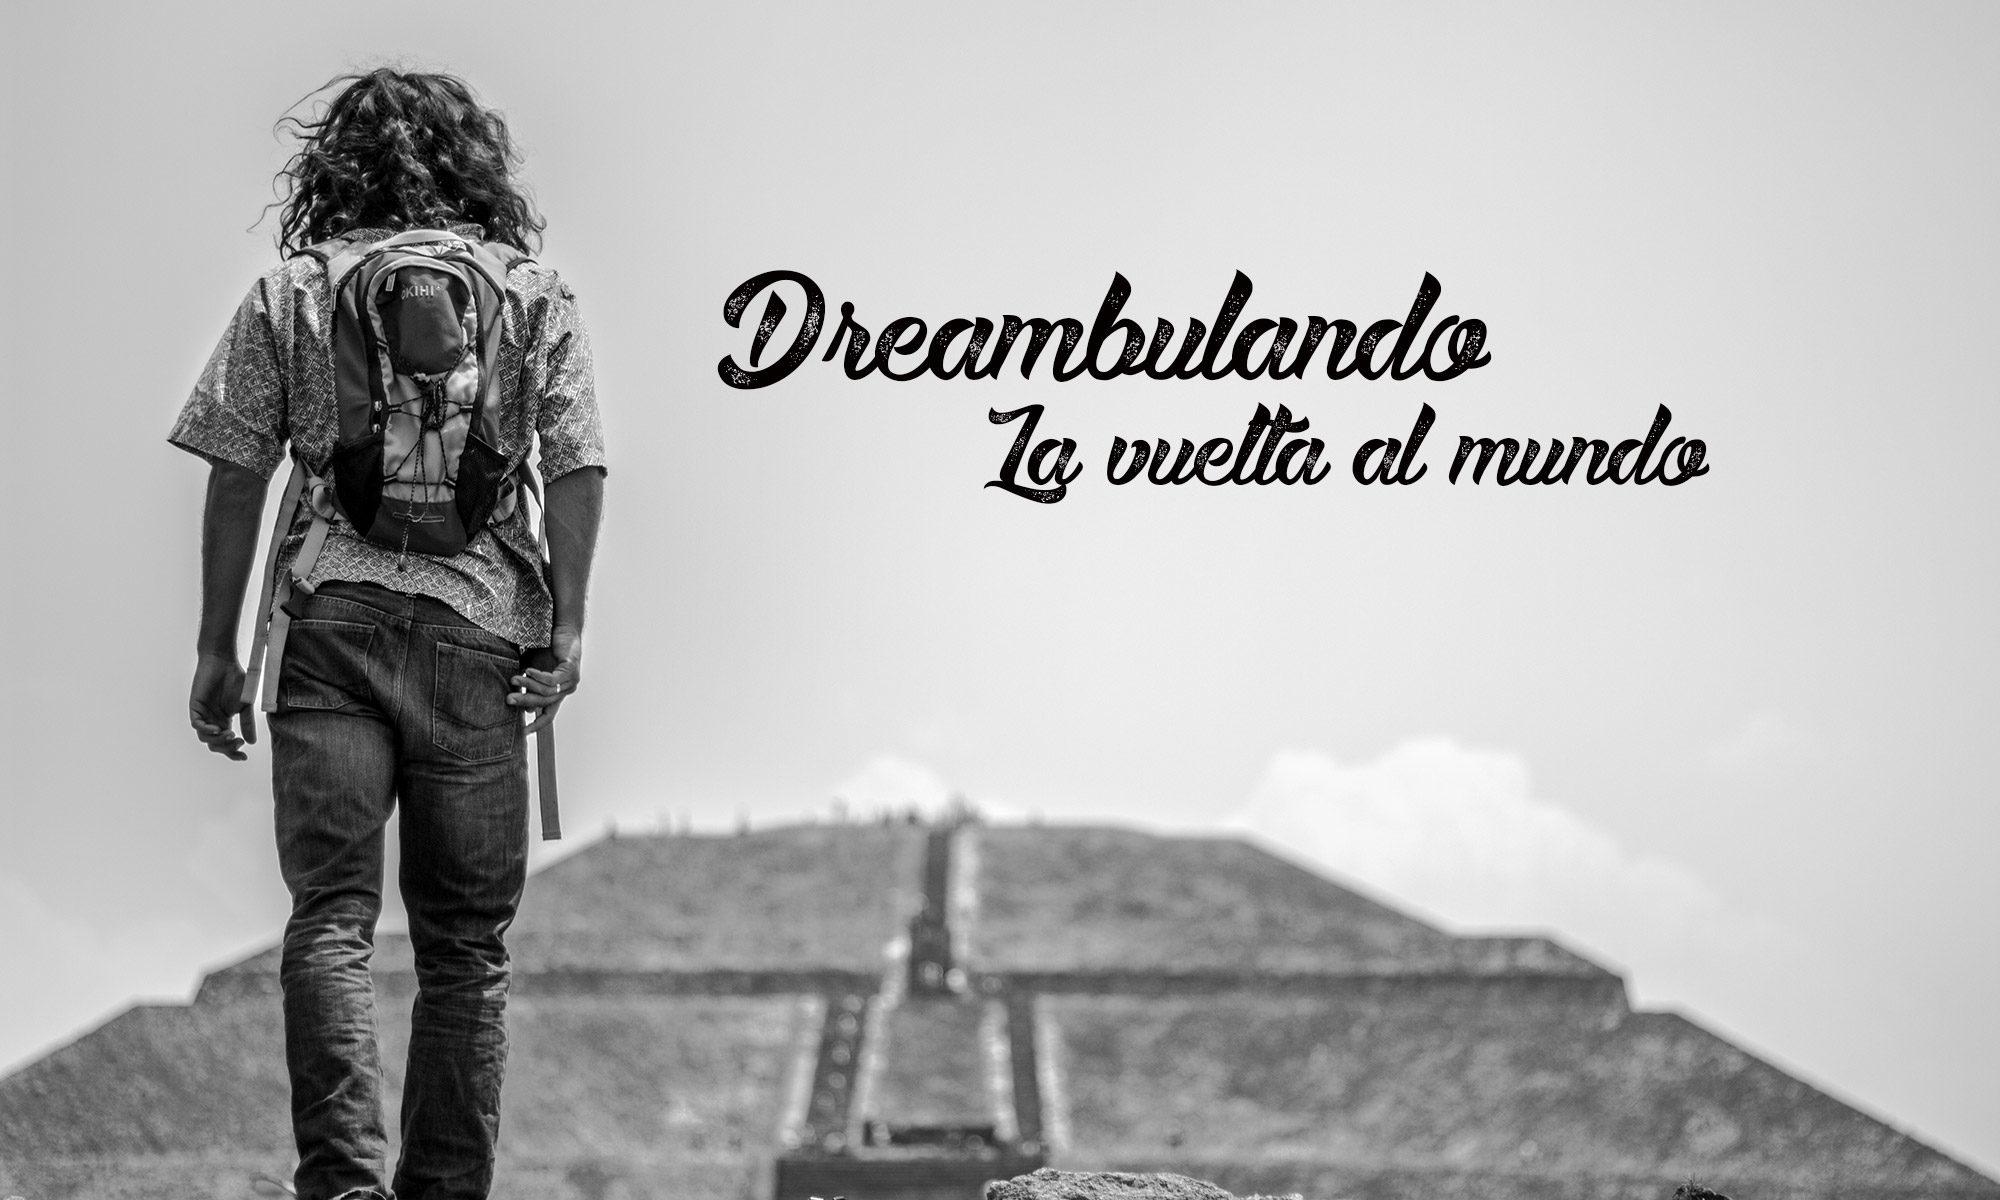 dreambular